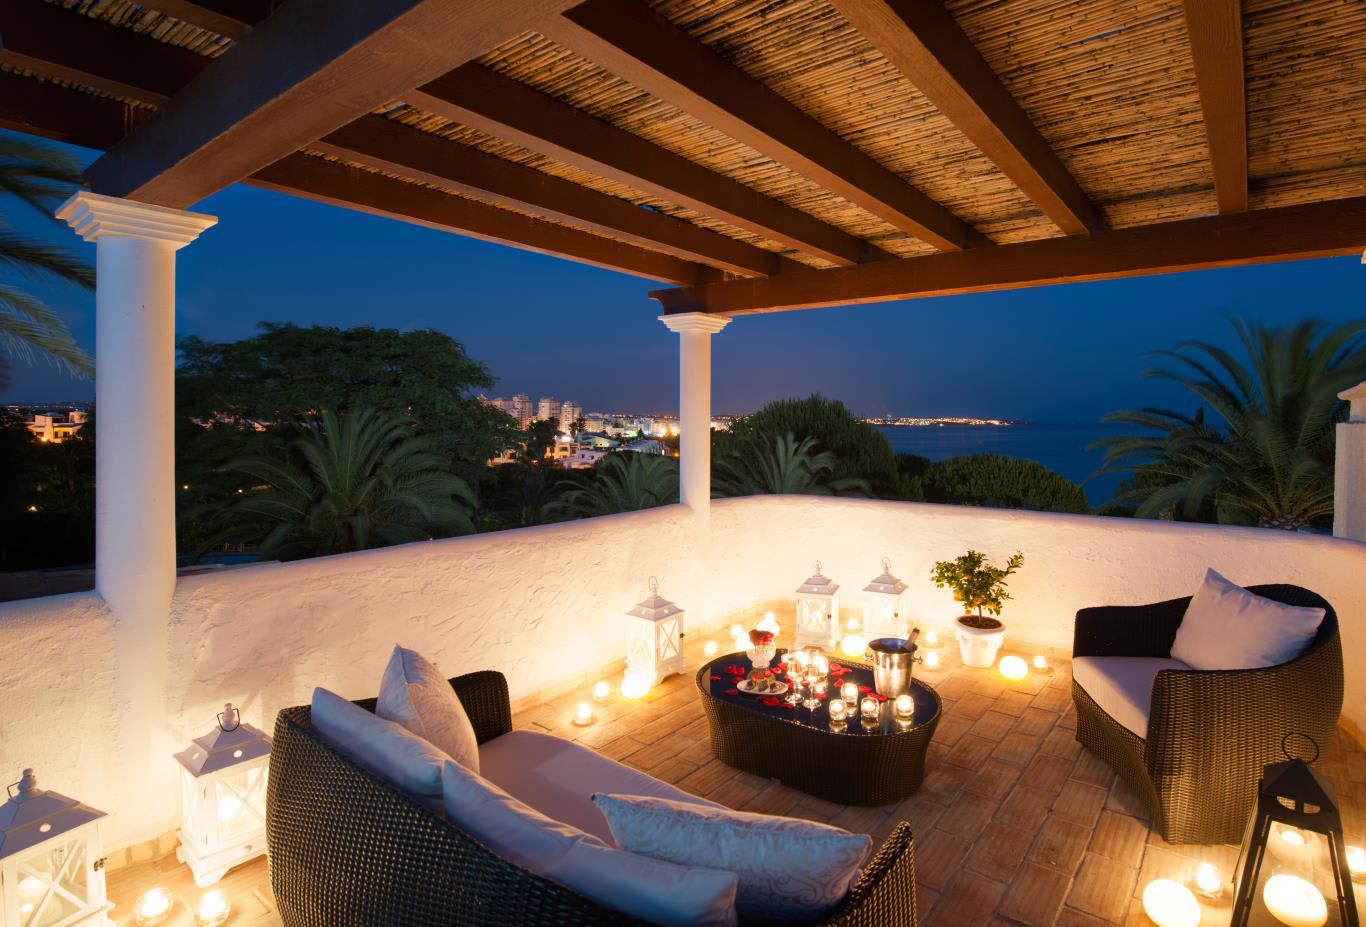 Oasis Premium Rooftop terrace night